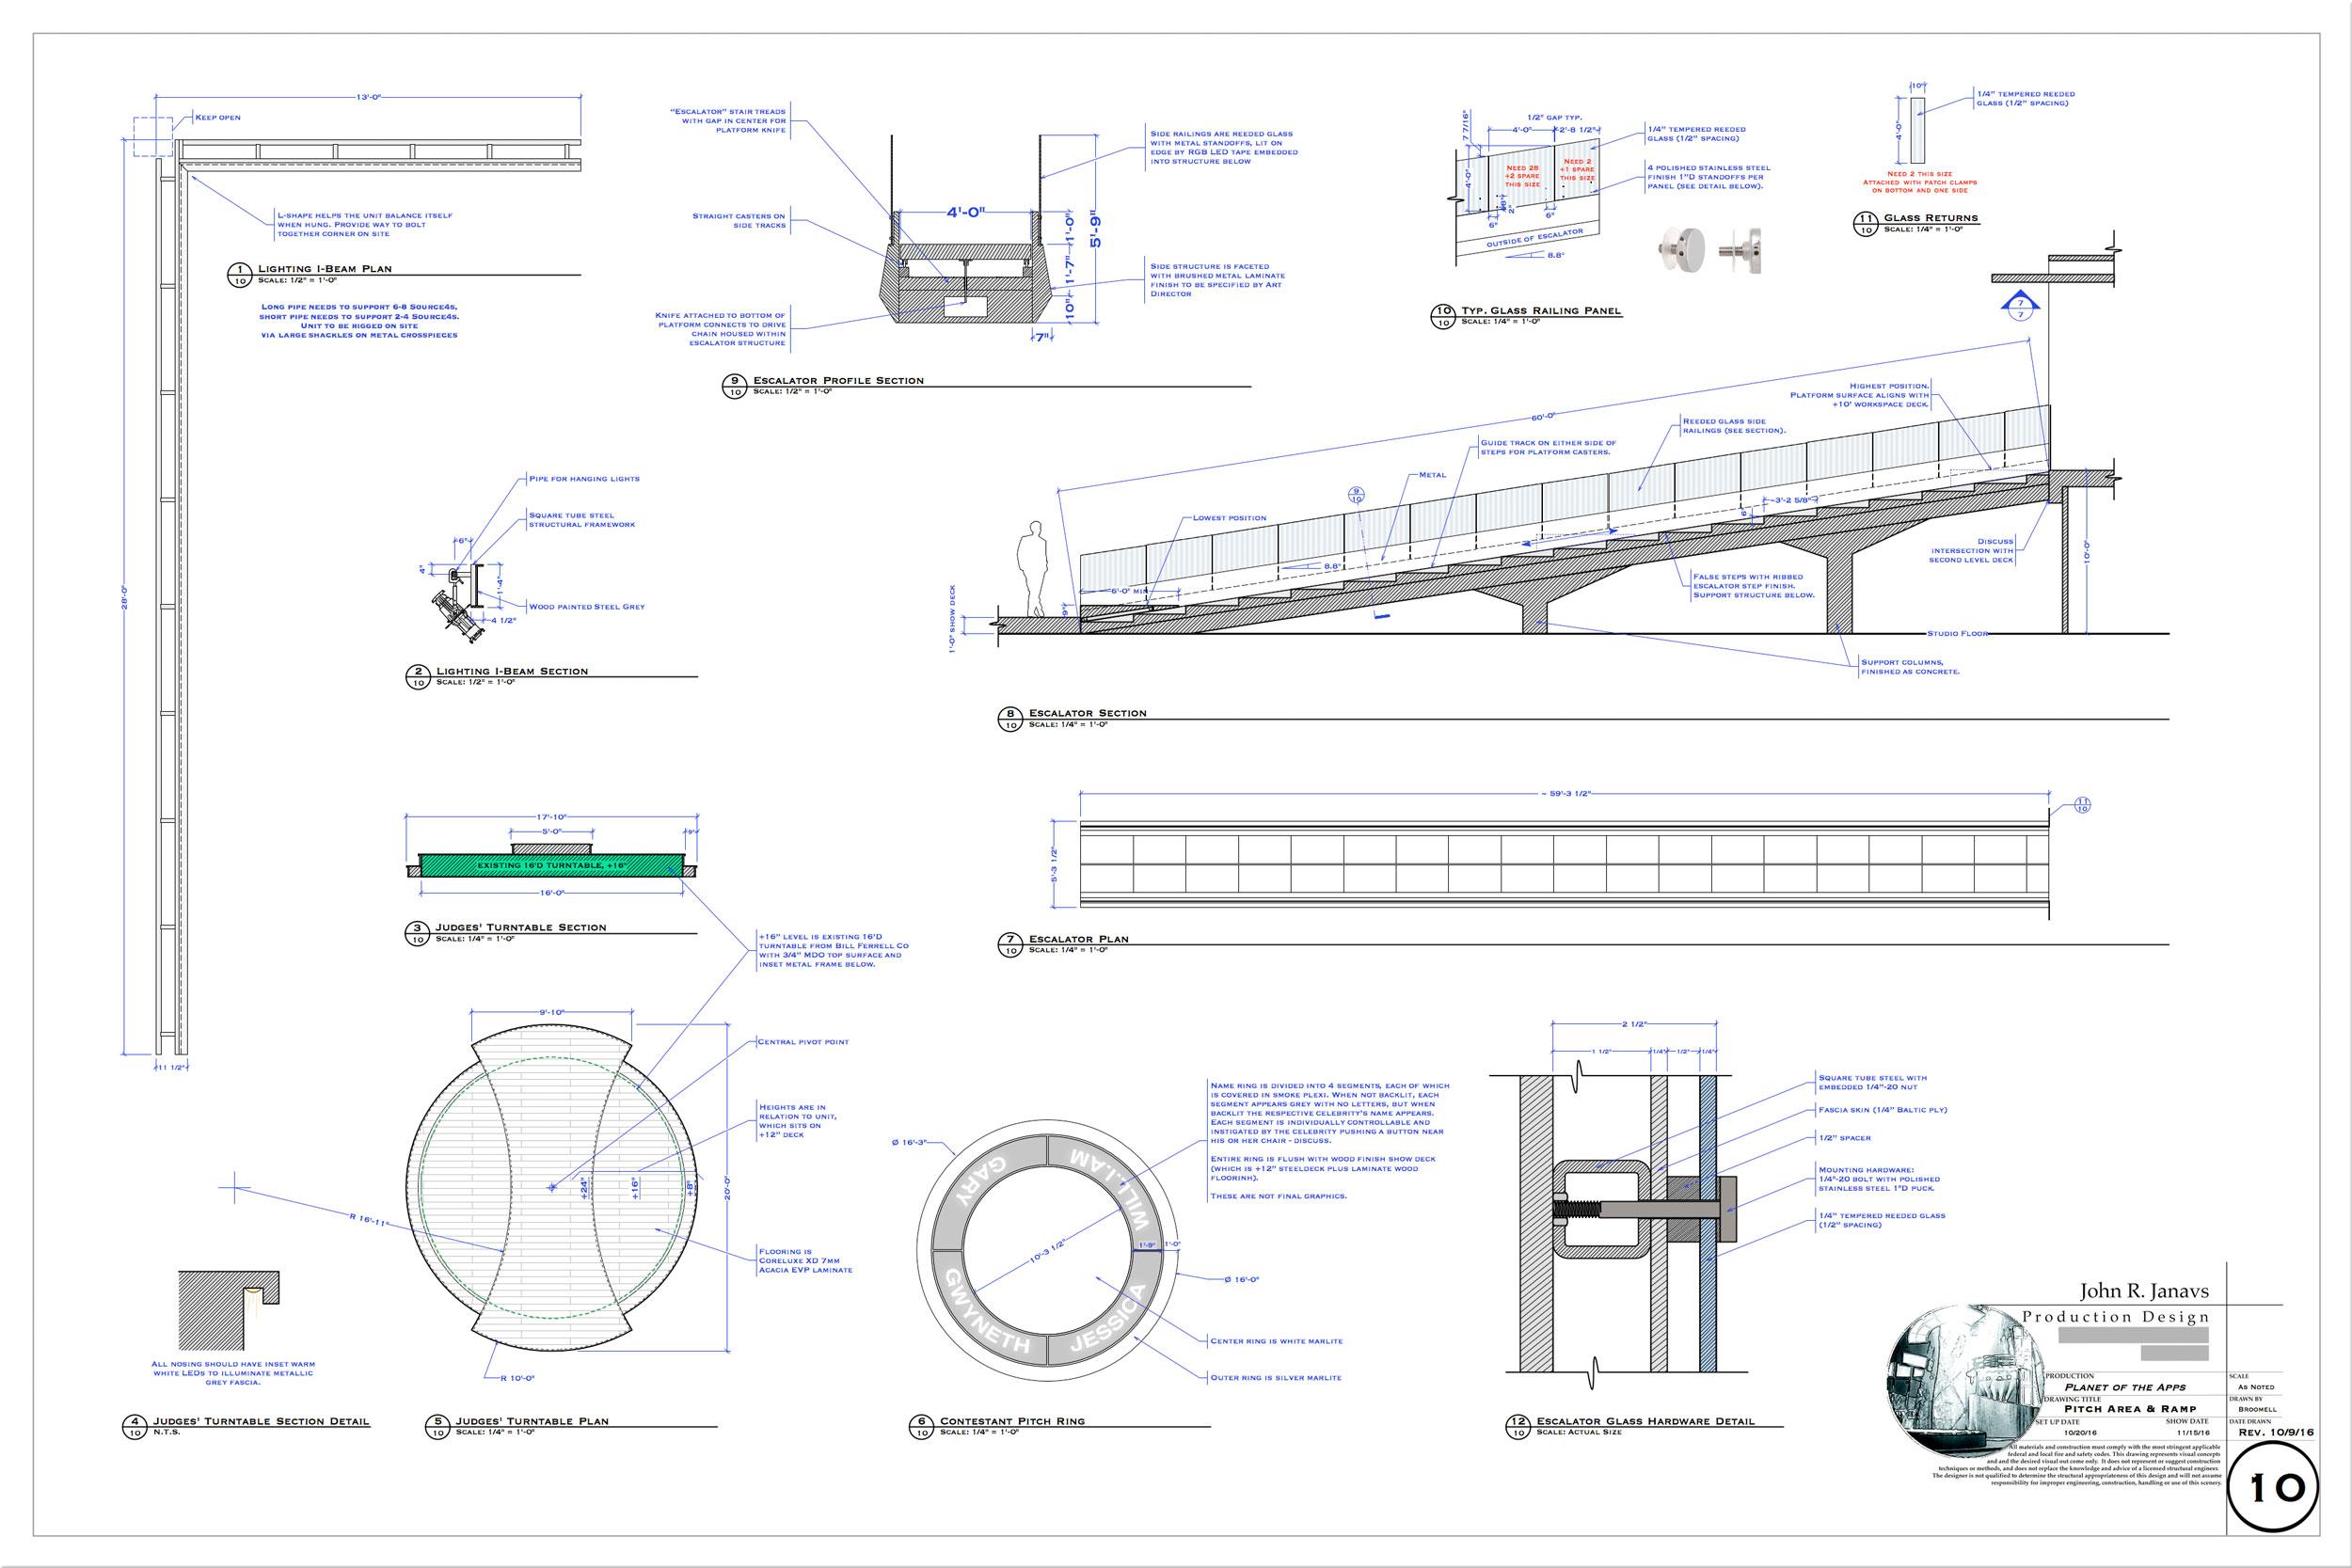 andy-broomell-set-design-drafting-pota4.jpg